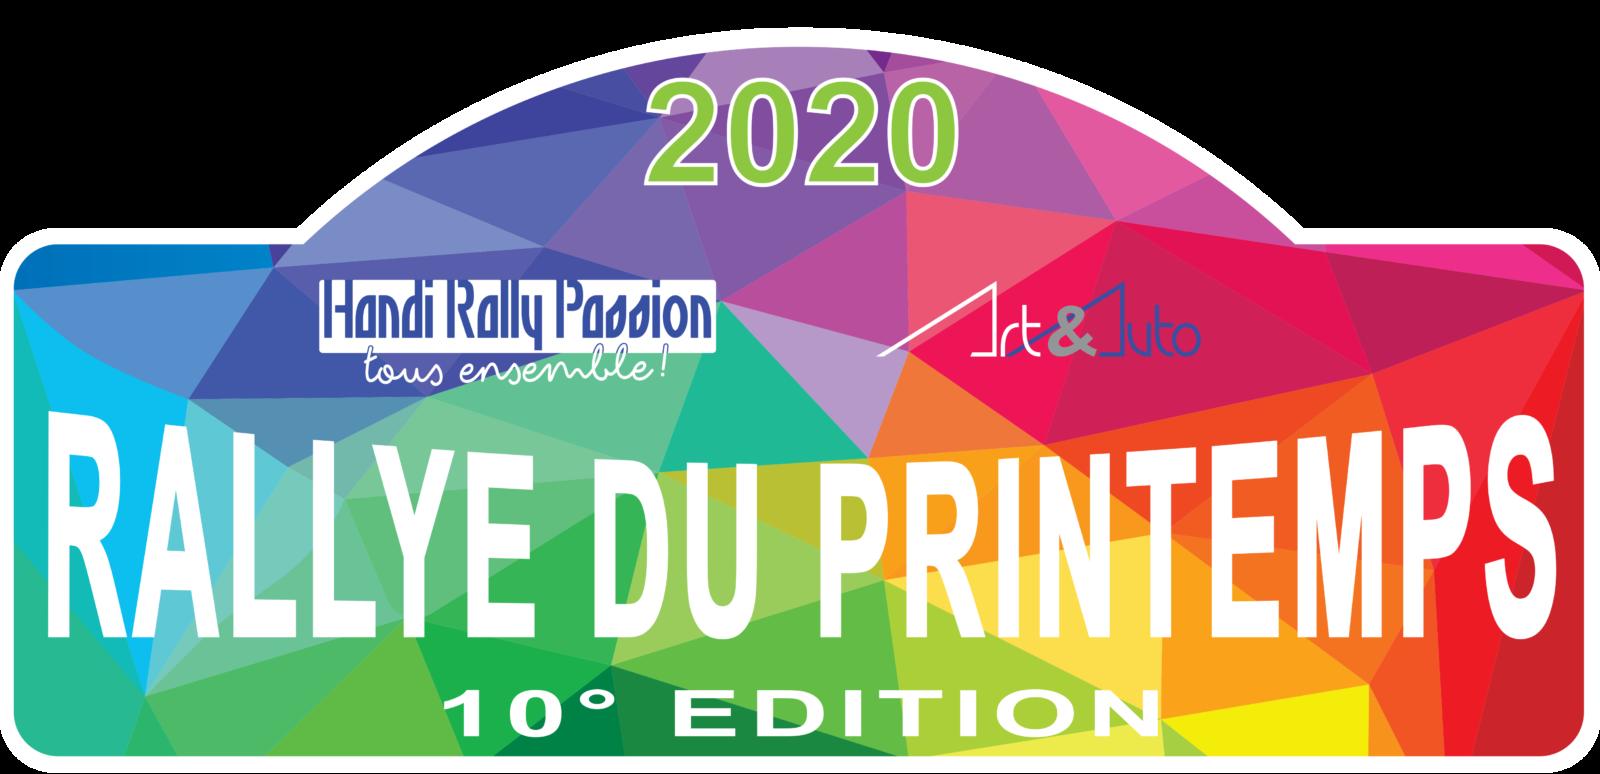 Rallye du Printemps_12 septembre 2020